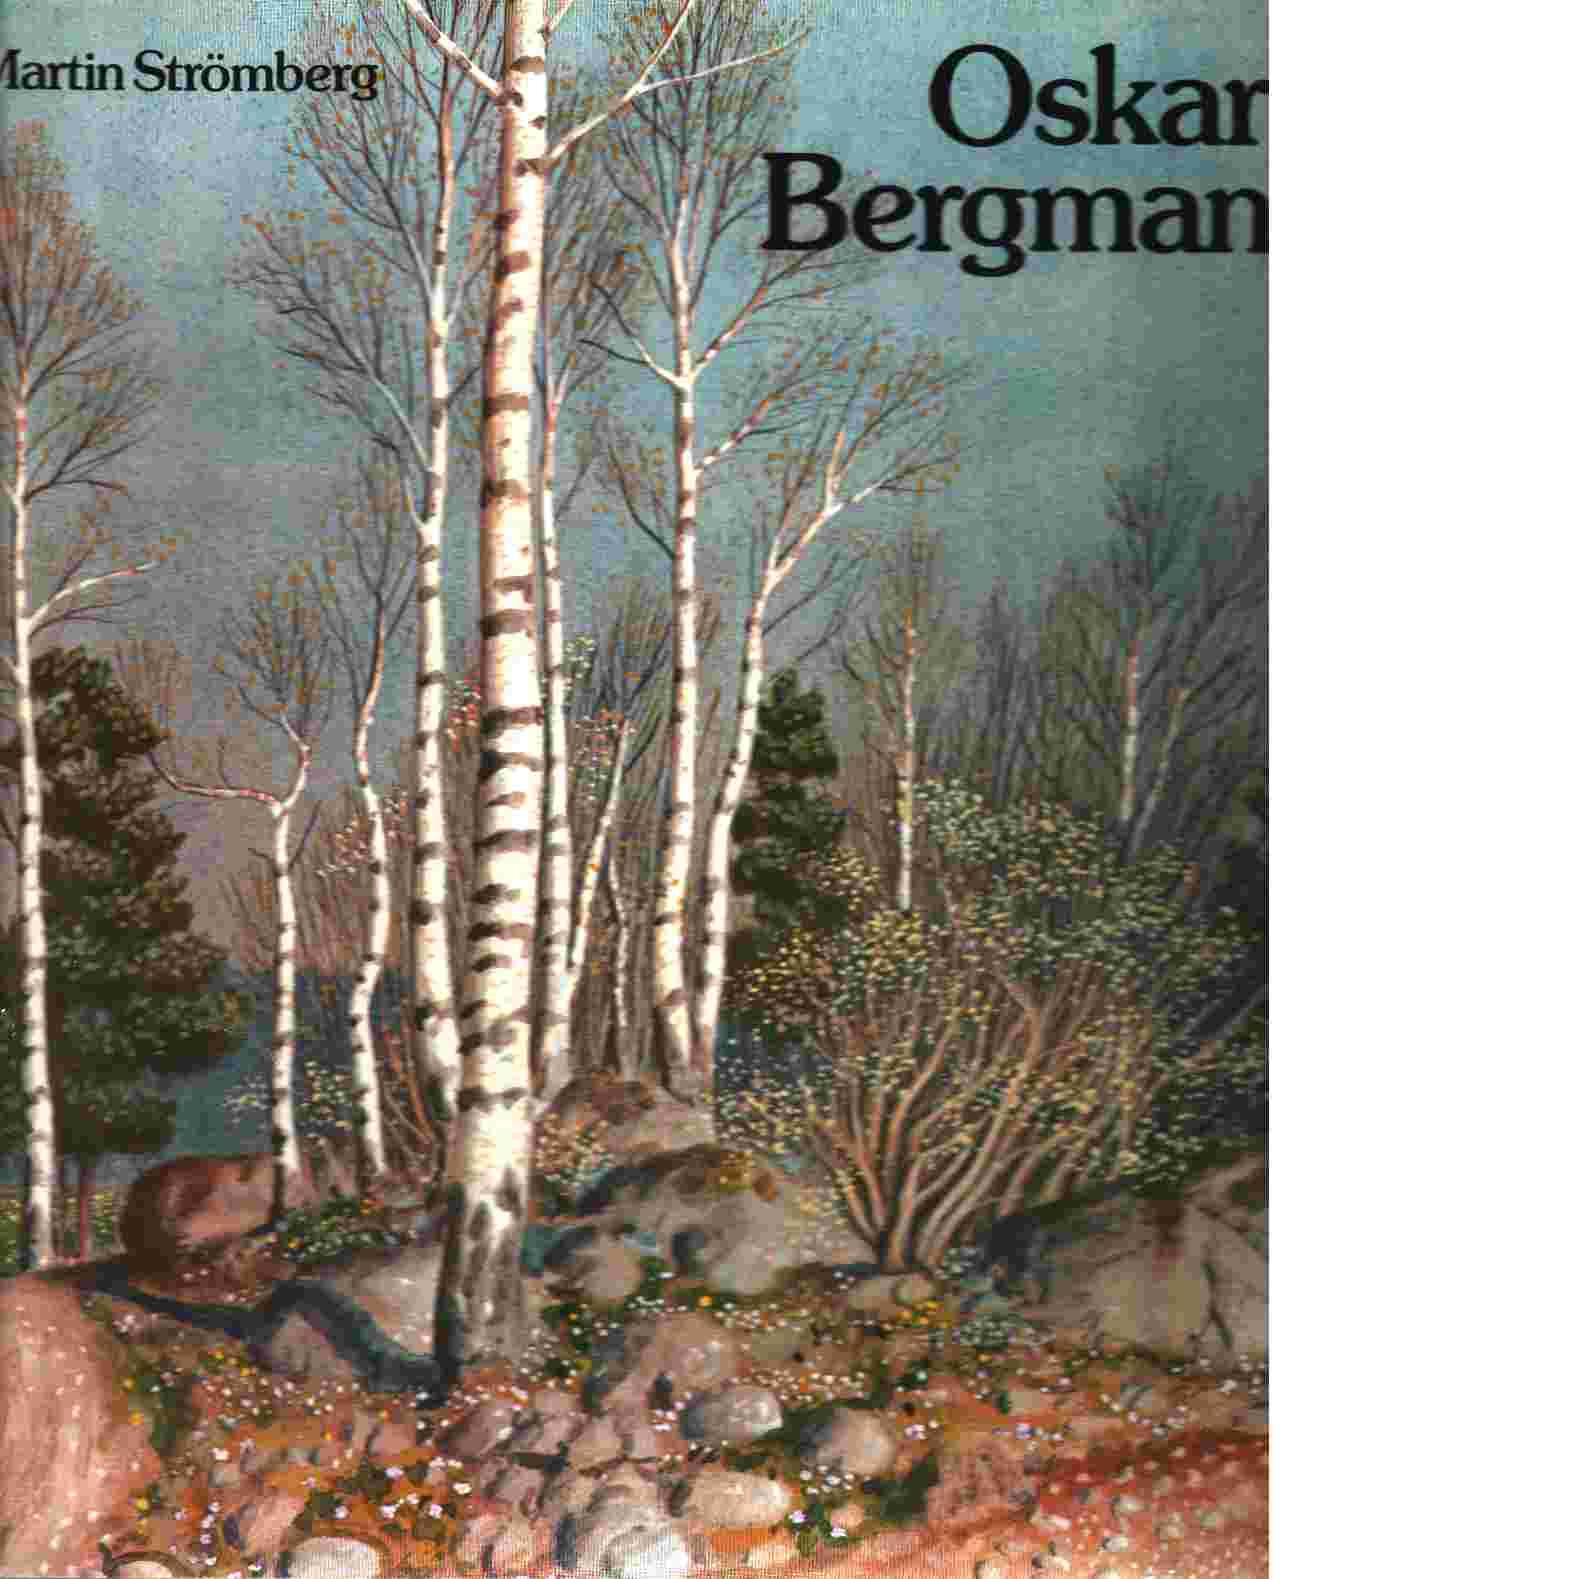 Oskar Bergman - Strömberg, Martin